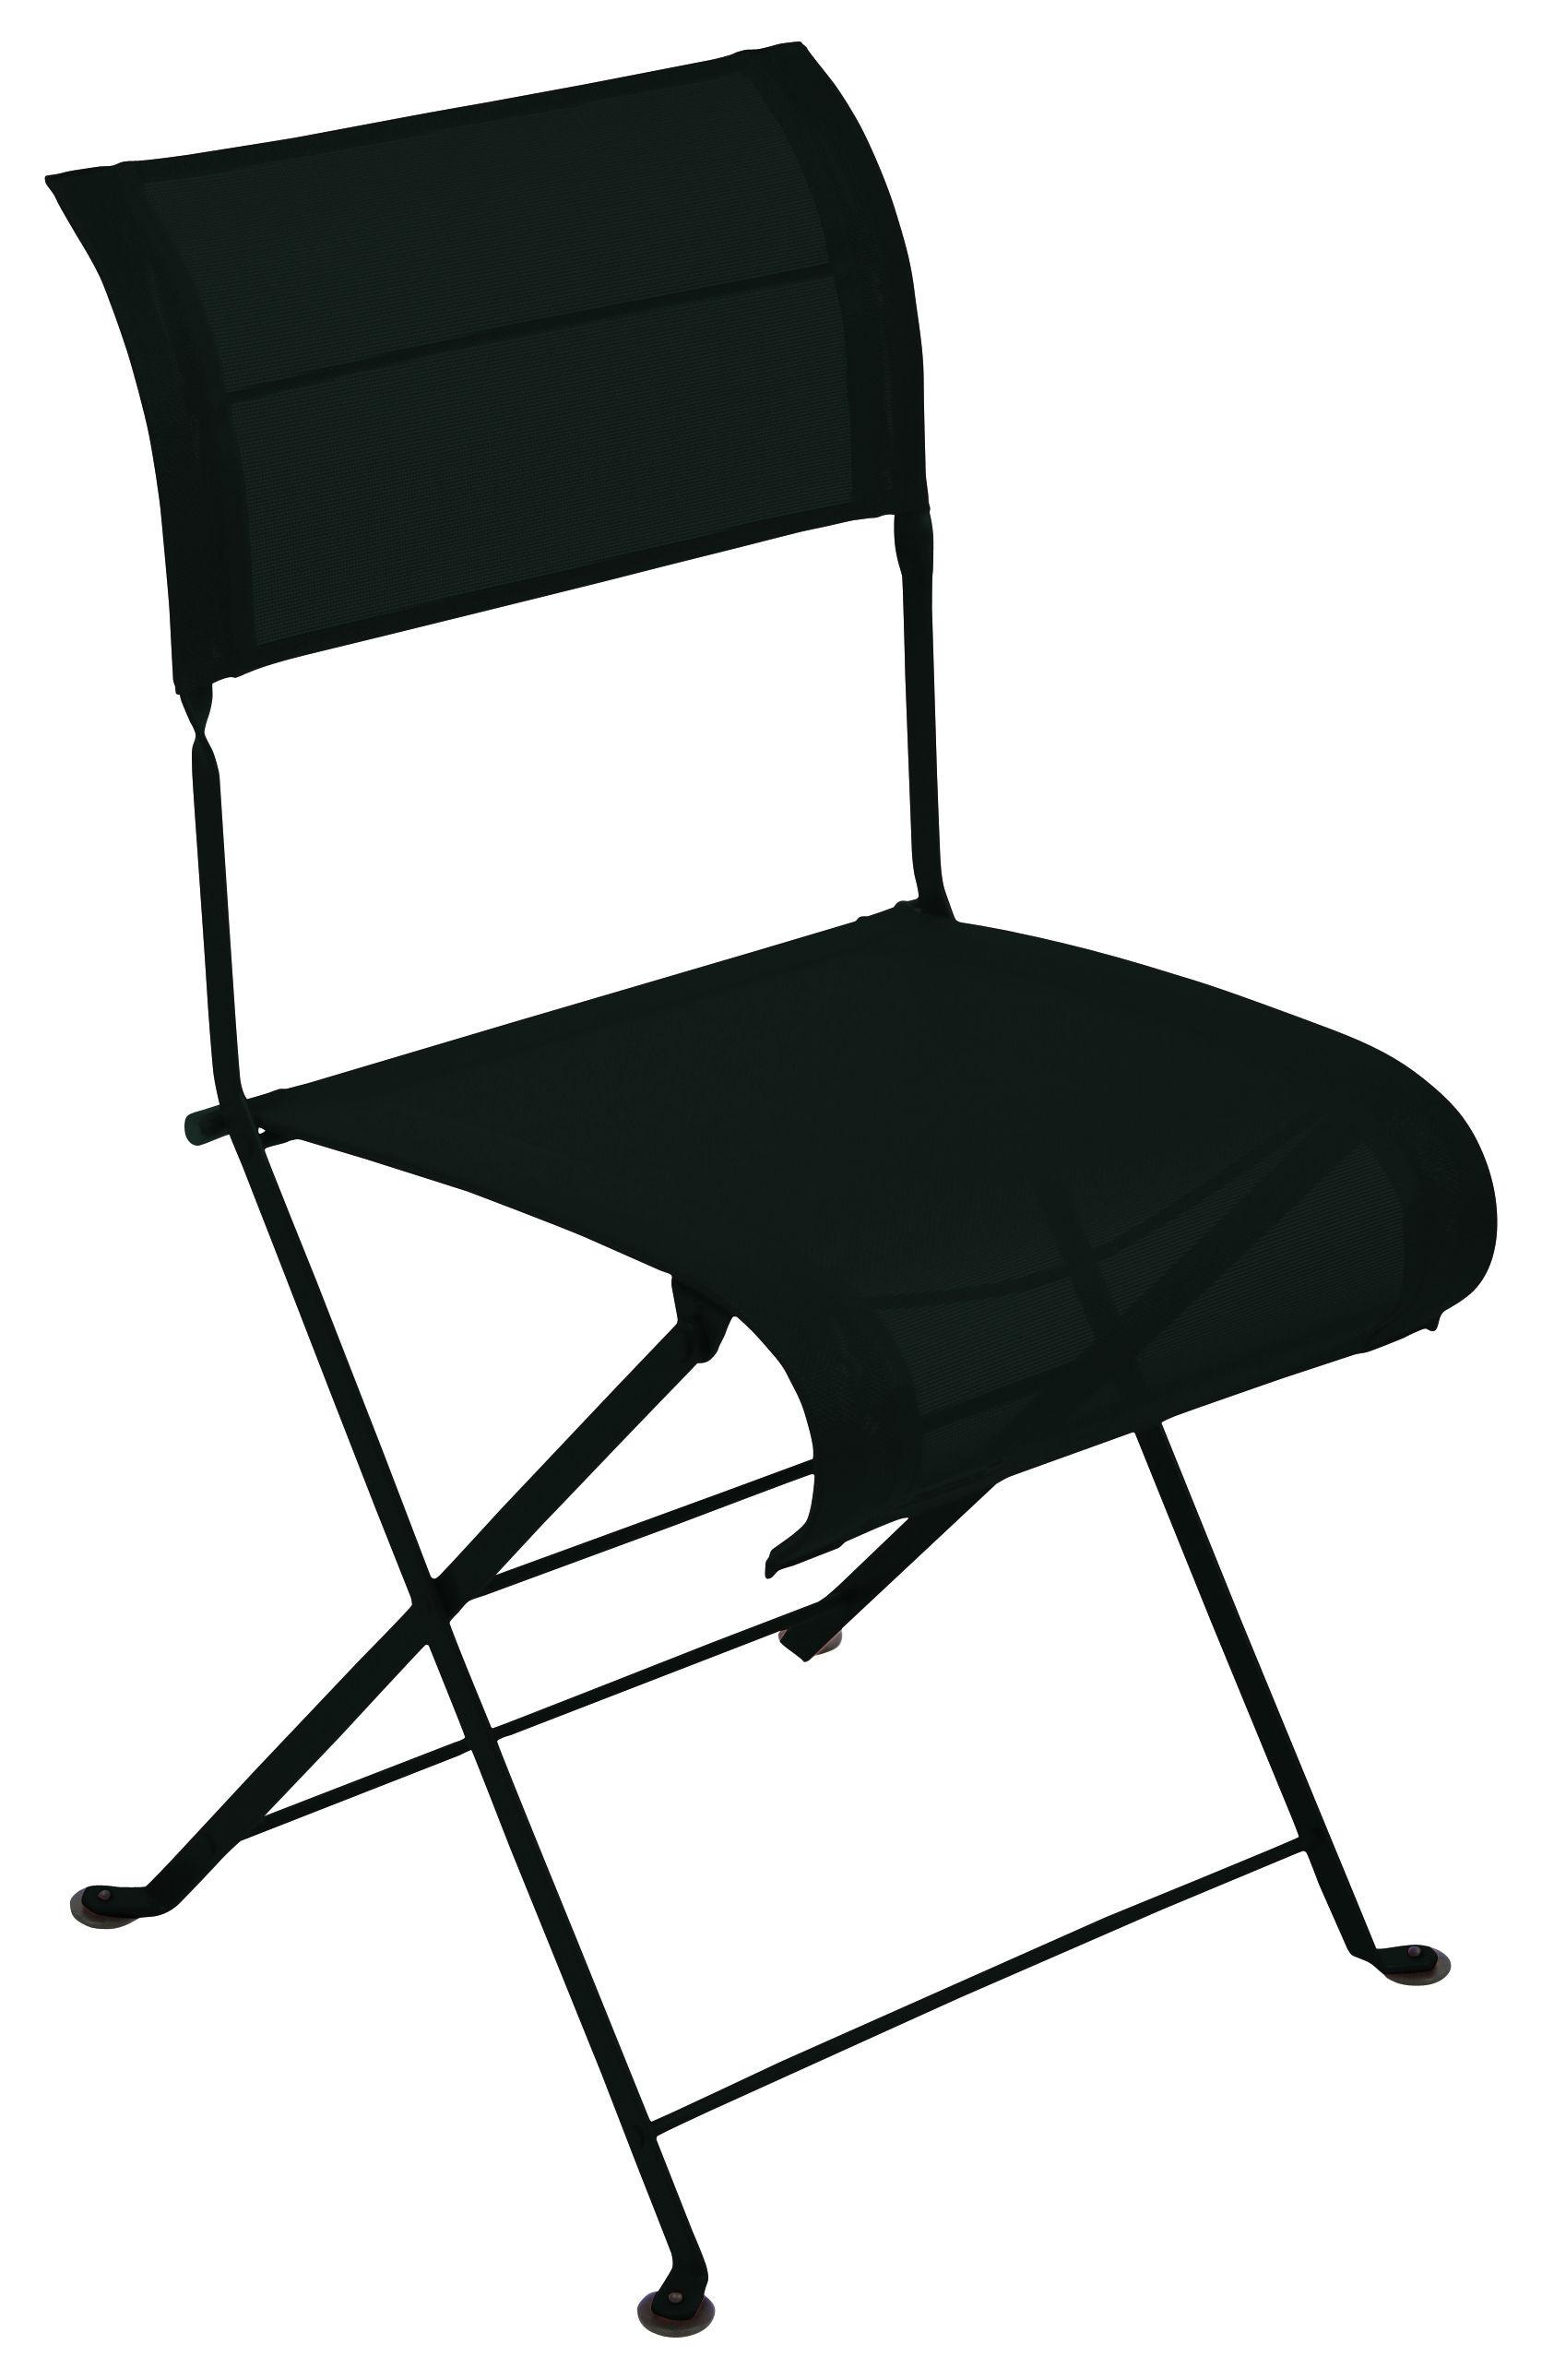 Möbel - Stühle  - Dune Klappstuhl Klappstuhl - Fermob - Lakritz - lackierter Stahl, Polyester-Gewebe